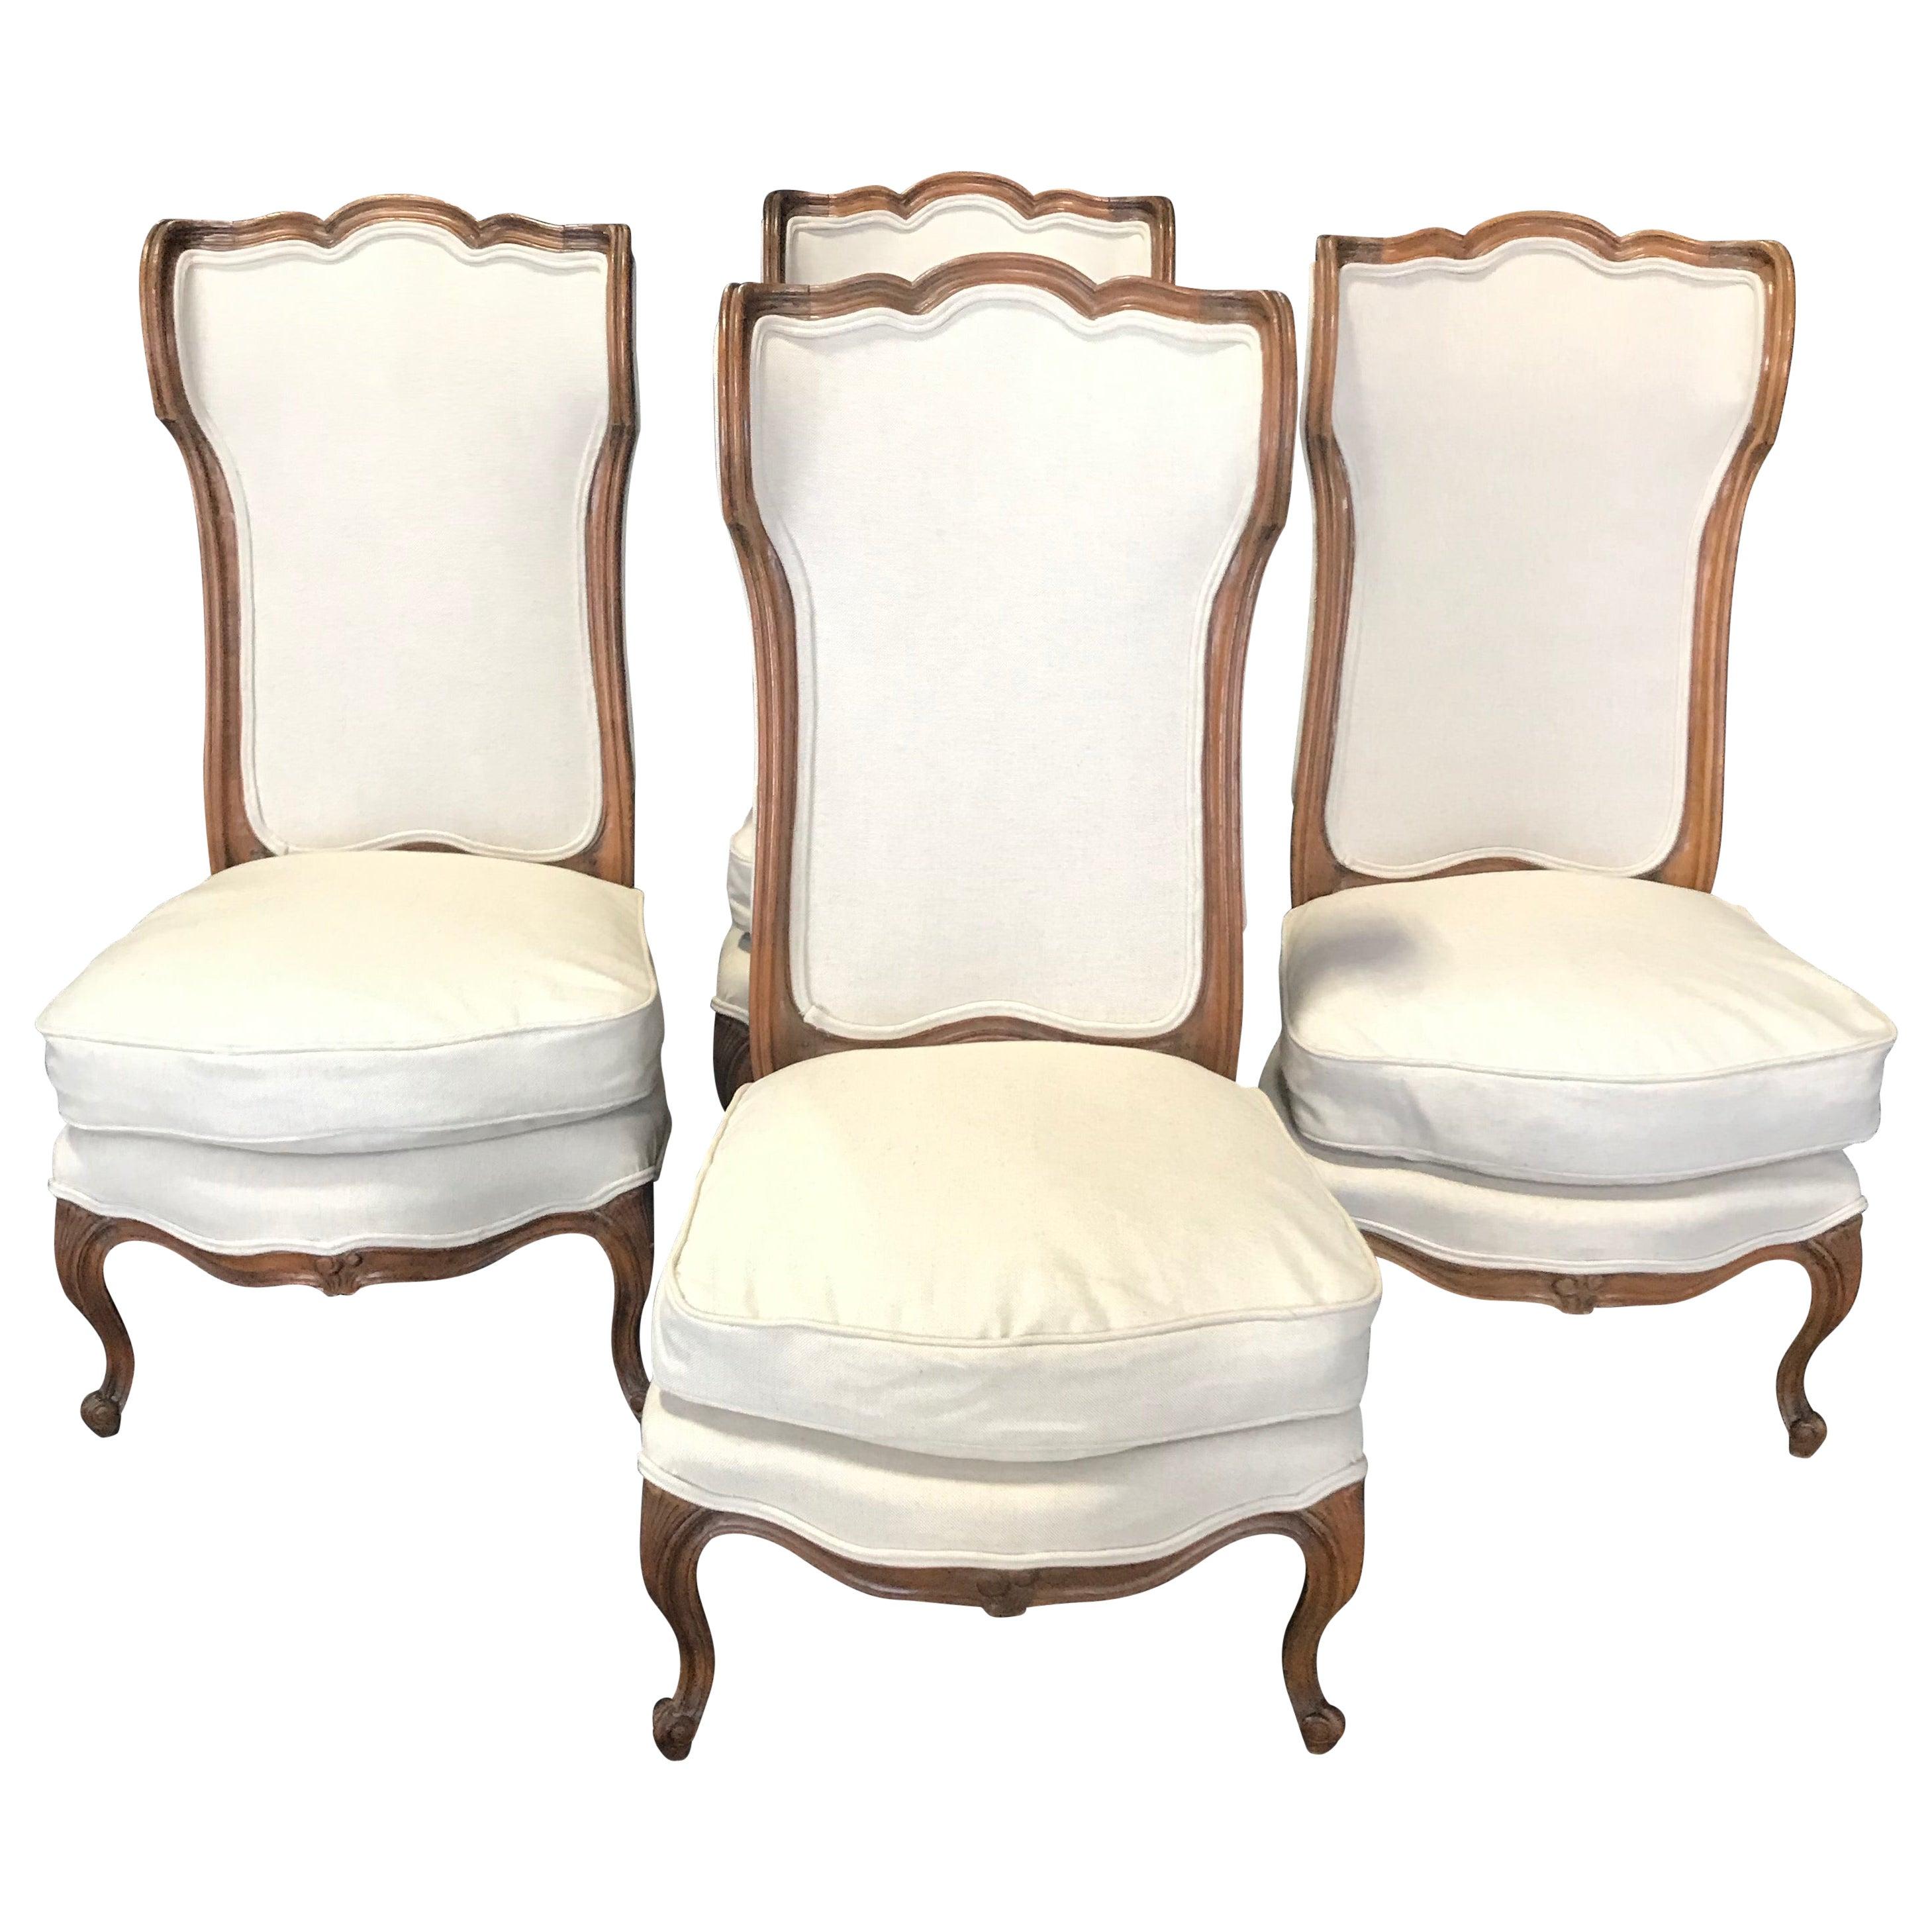 Set of Four 19th Century Curvy Elegant French Louis XVI Style Wingback Bergères